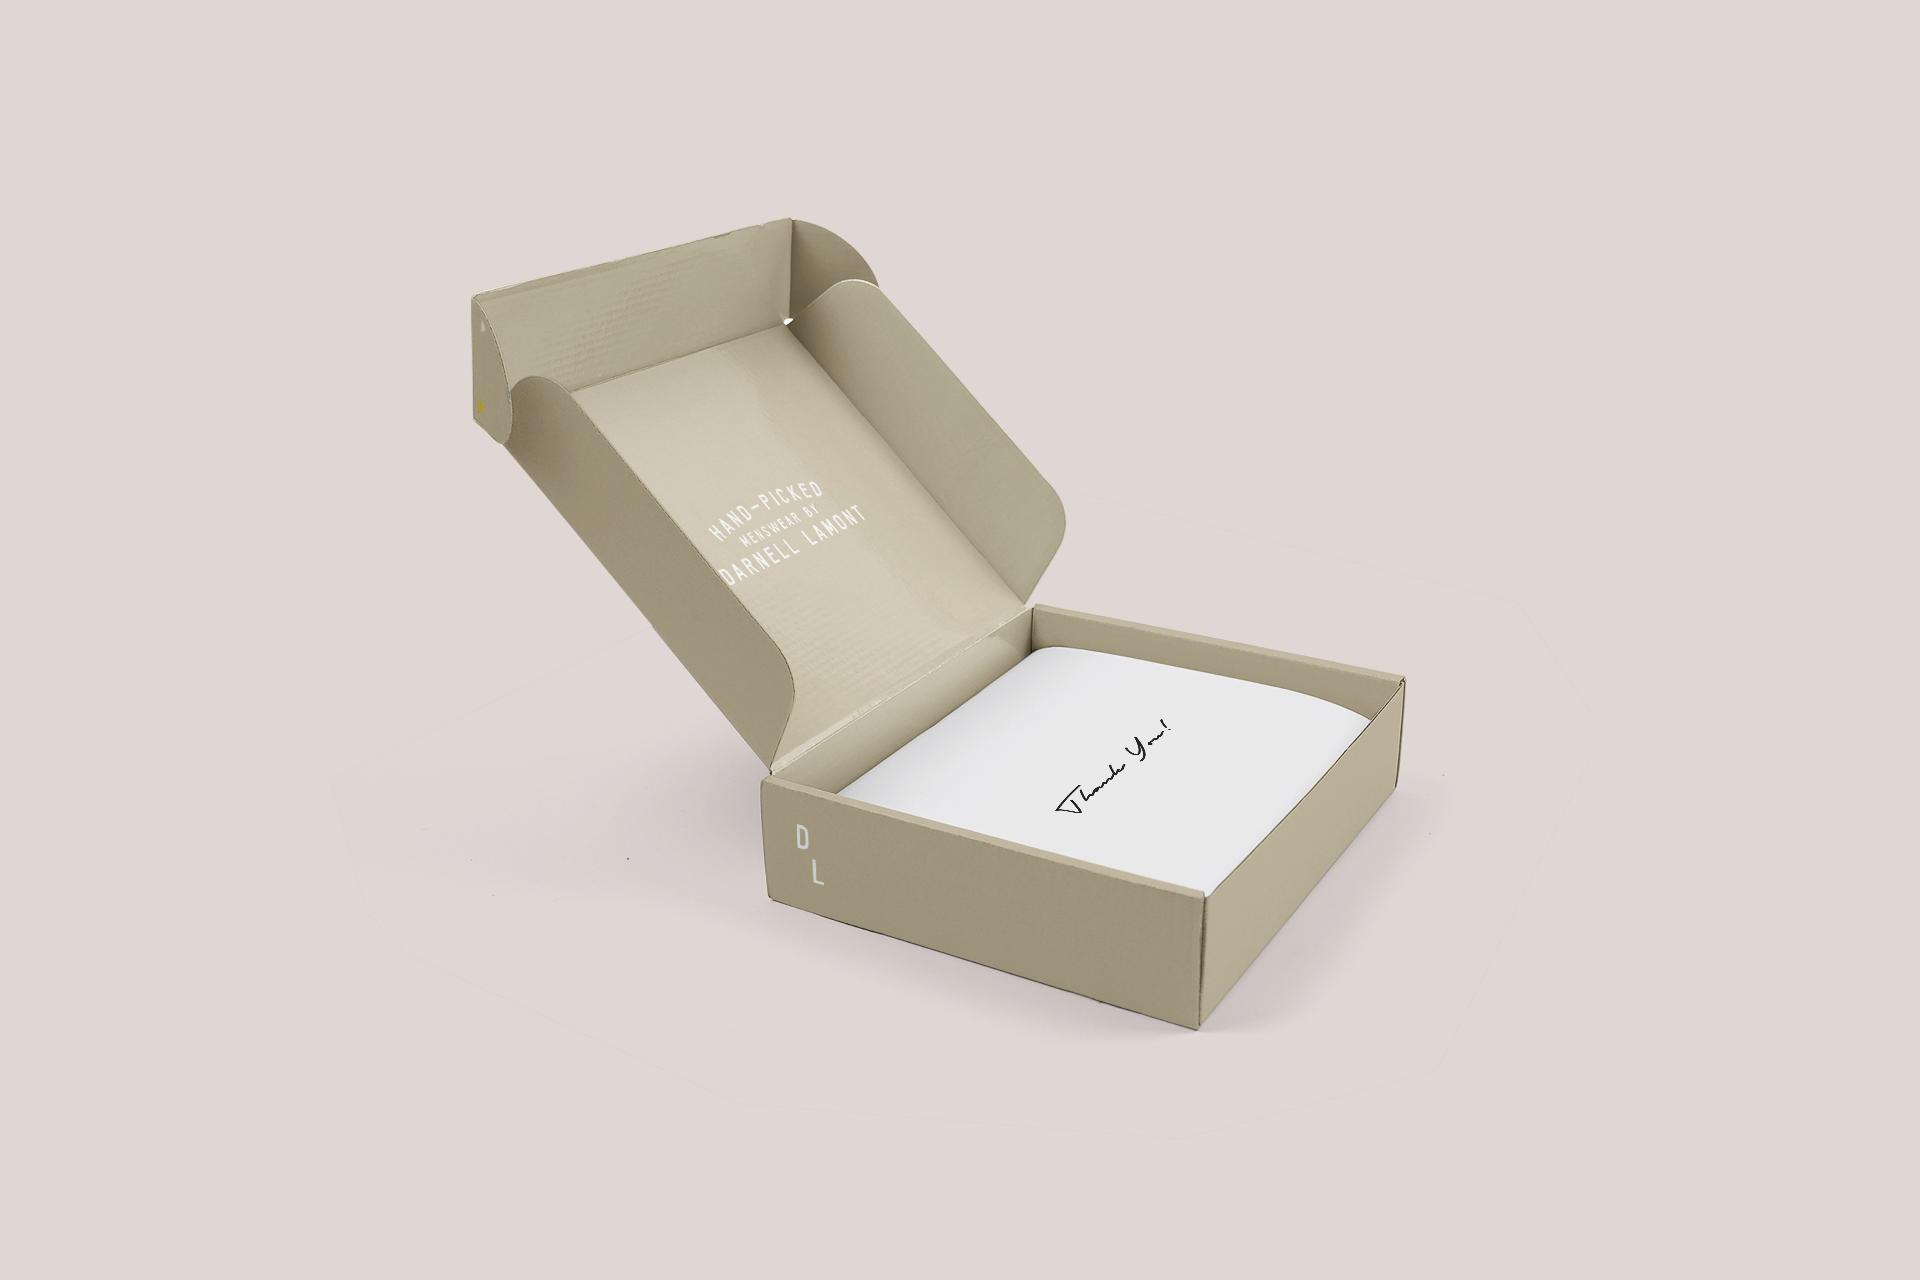 HPMWDL-Box-Darnell-Lamont_03.png